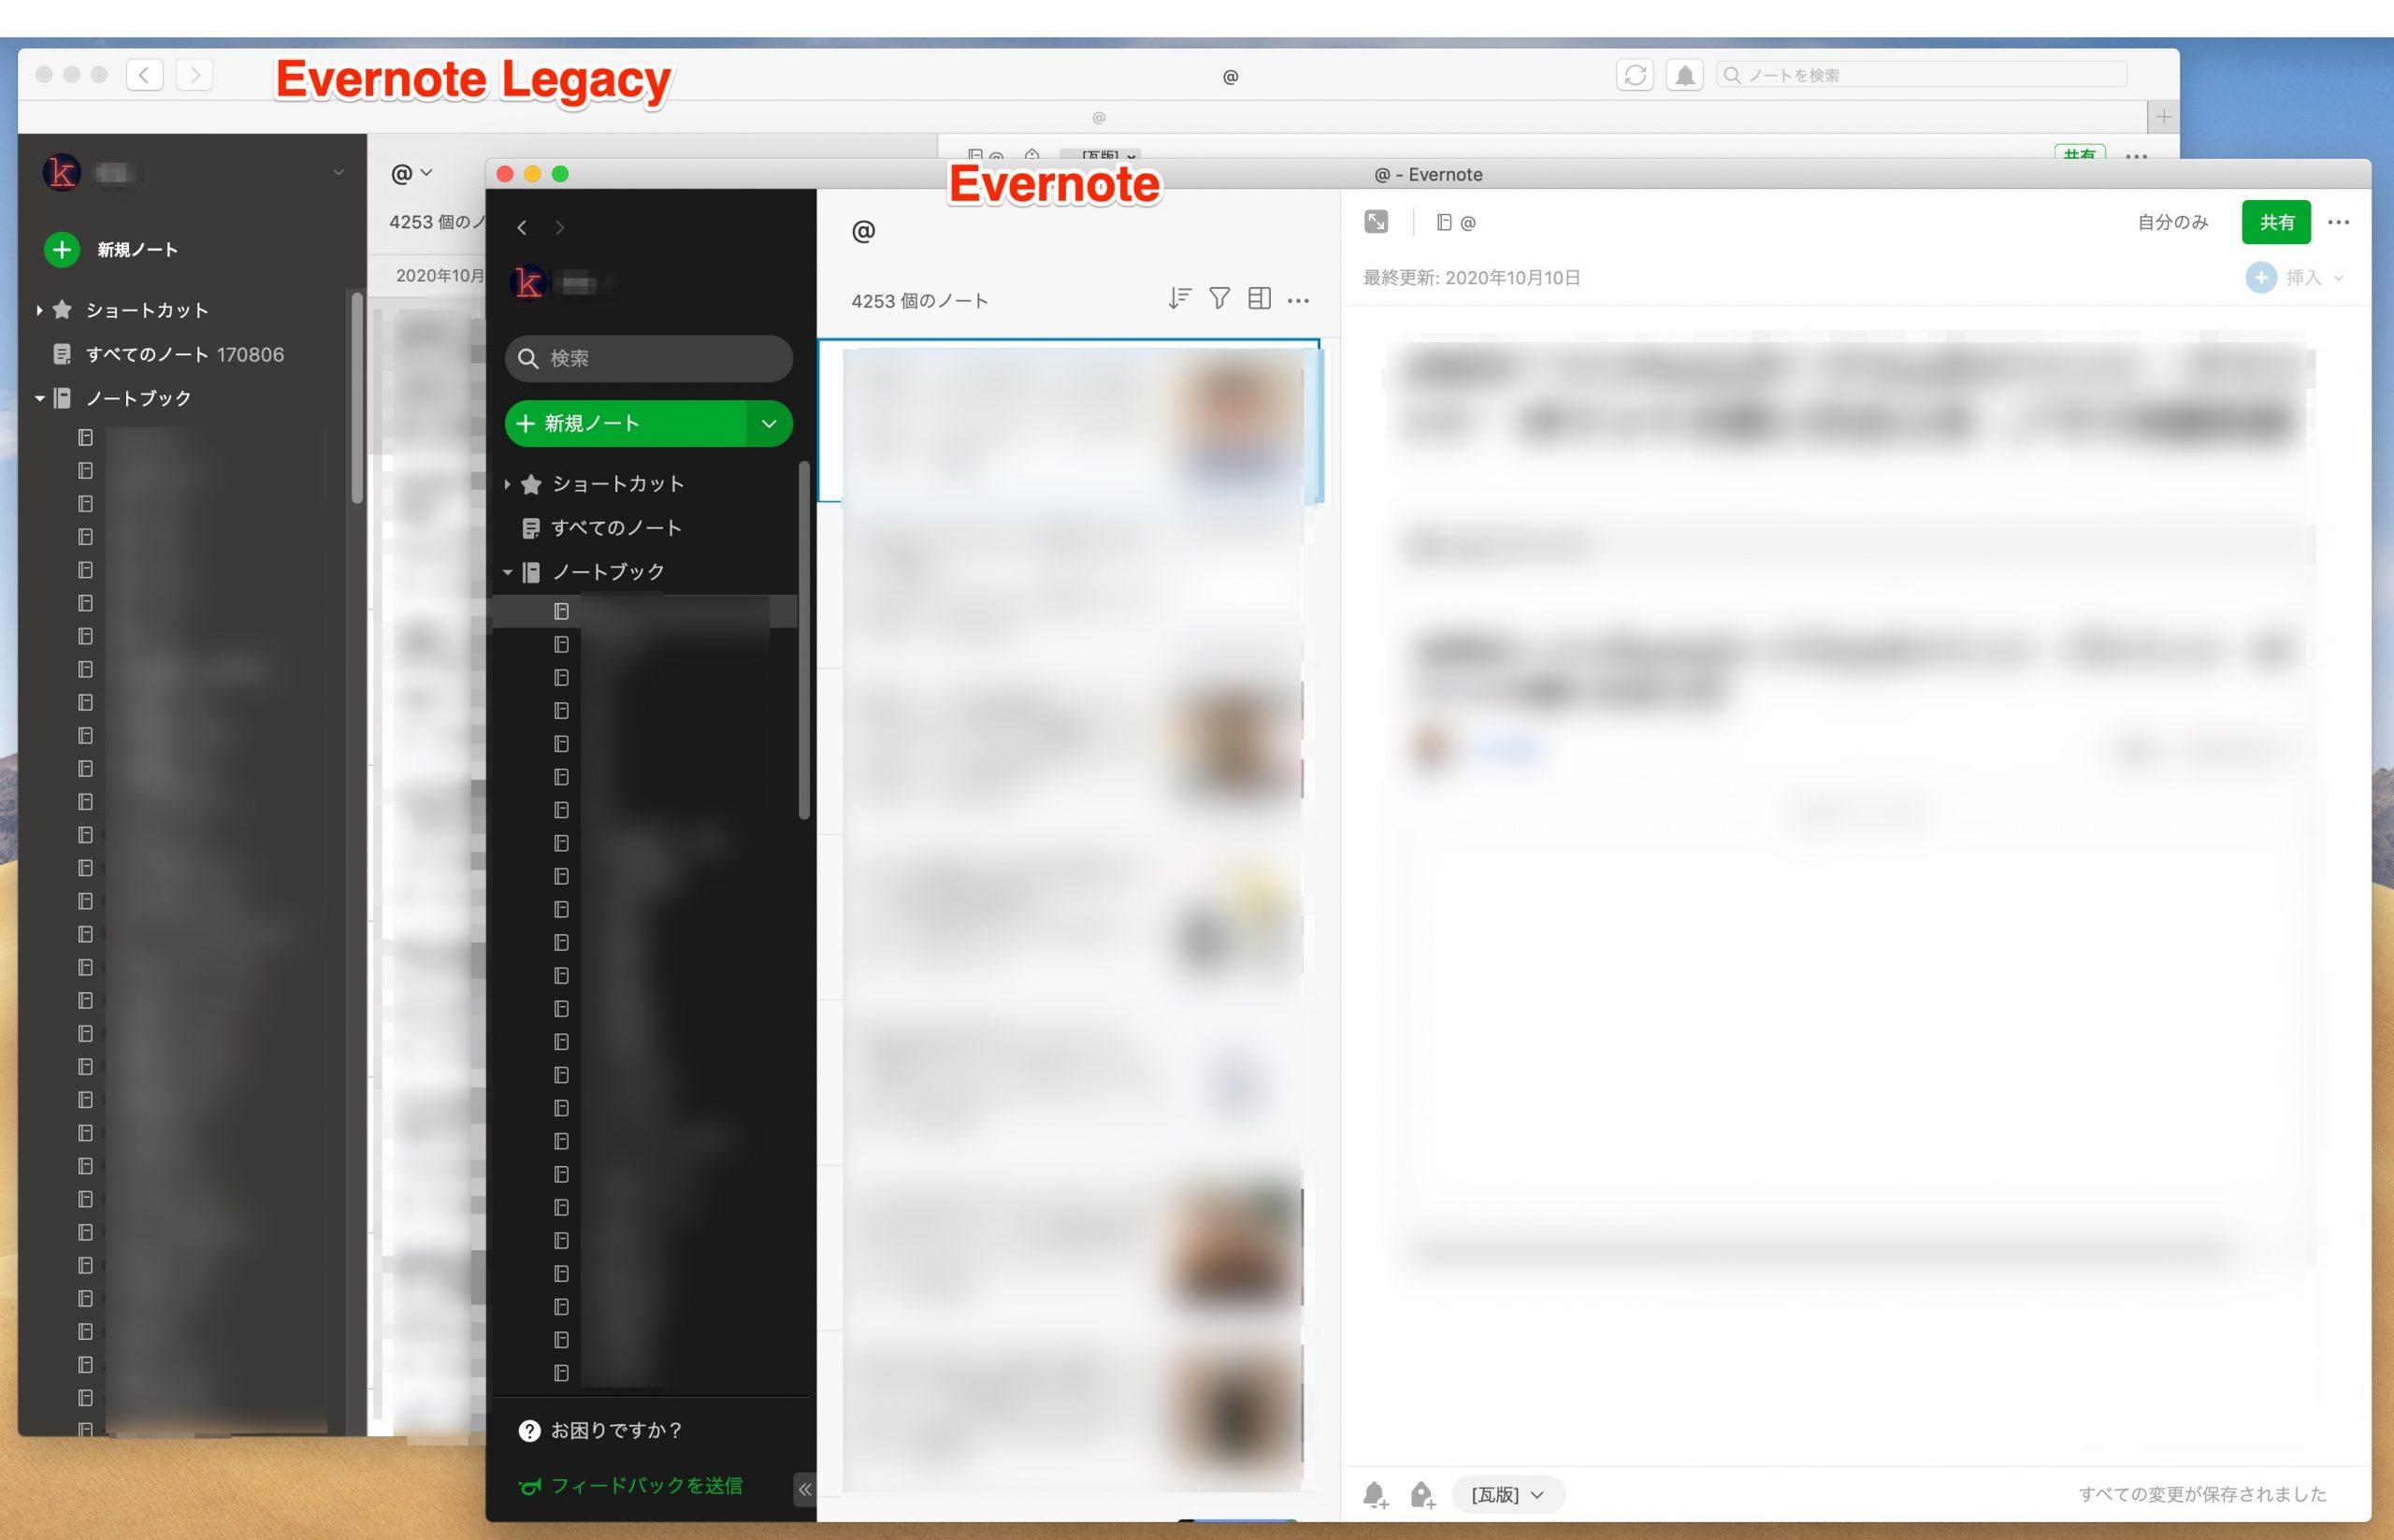 EvernoteとEvernote Legacy